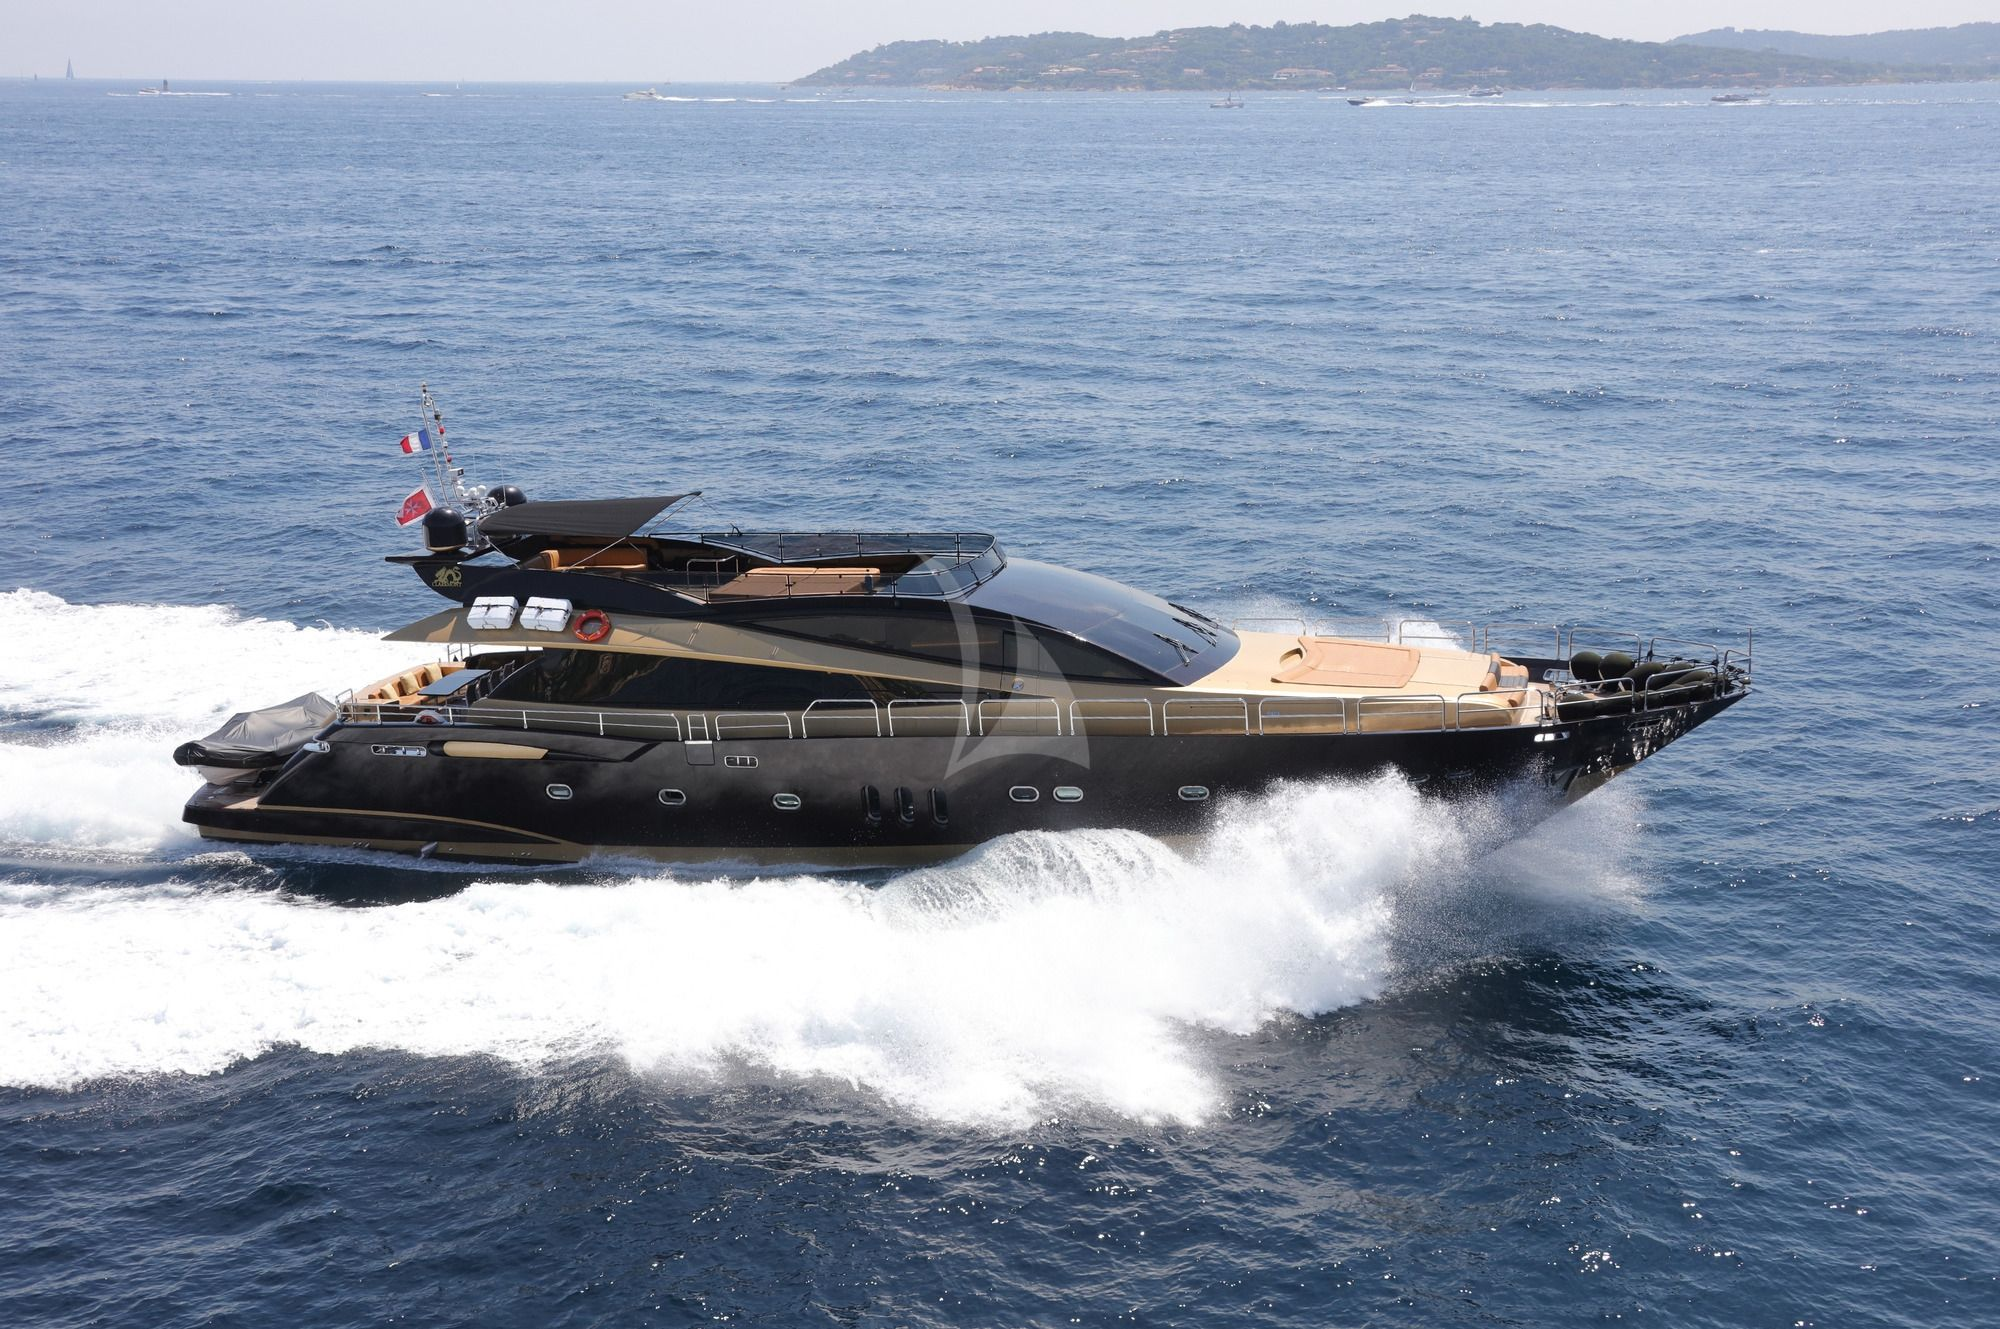 CLAREMONT - VGB Superyachts 105 - 4 Cabins - Cannes - Nice - Monaco - Antibes